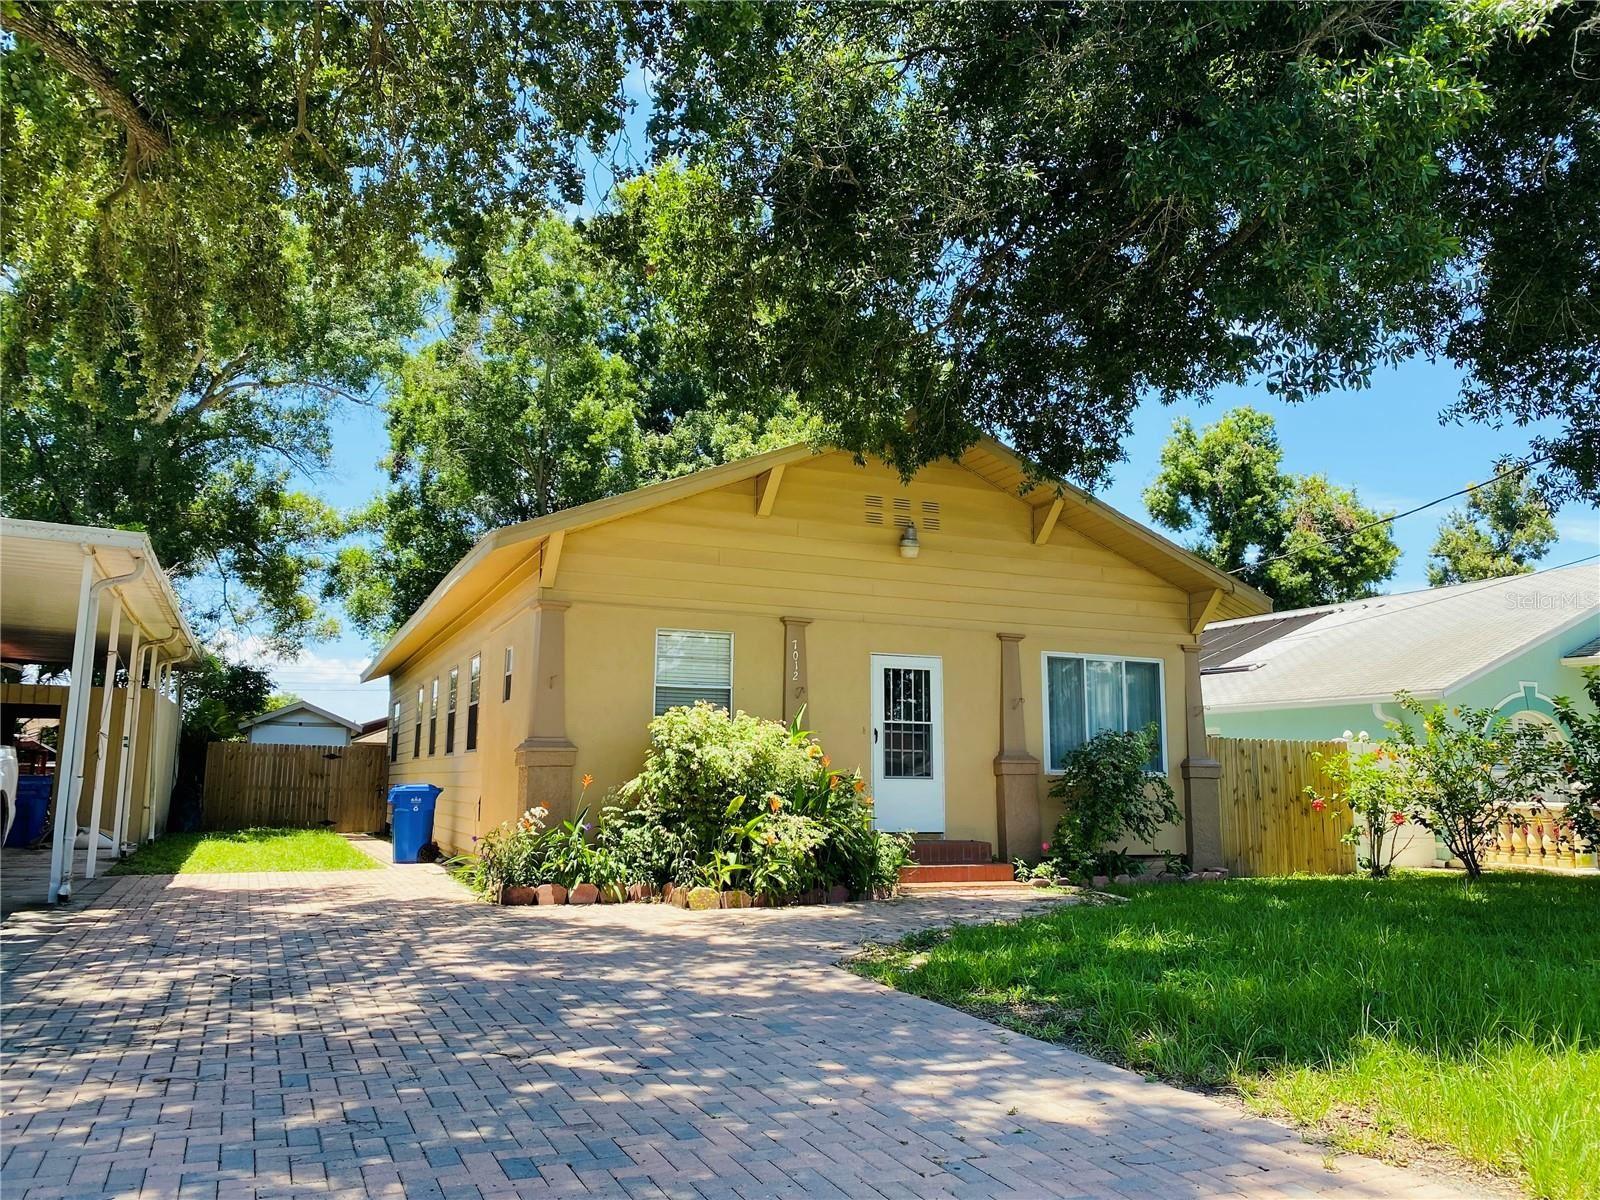 7012 N HUBERT AVENUE, Tampa, FL 33614 - #: T3317395